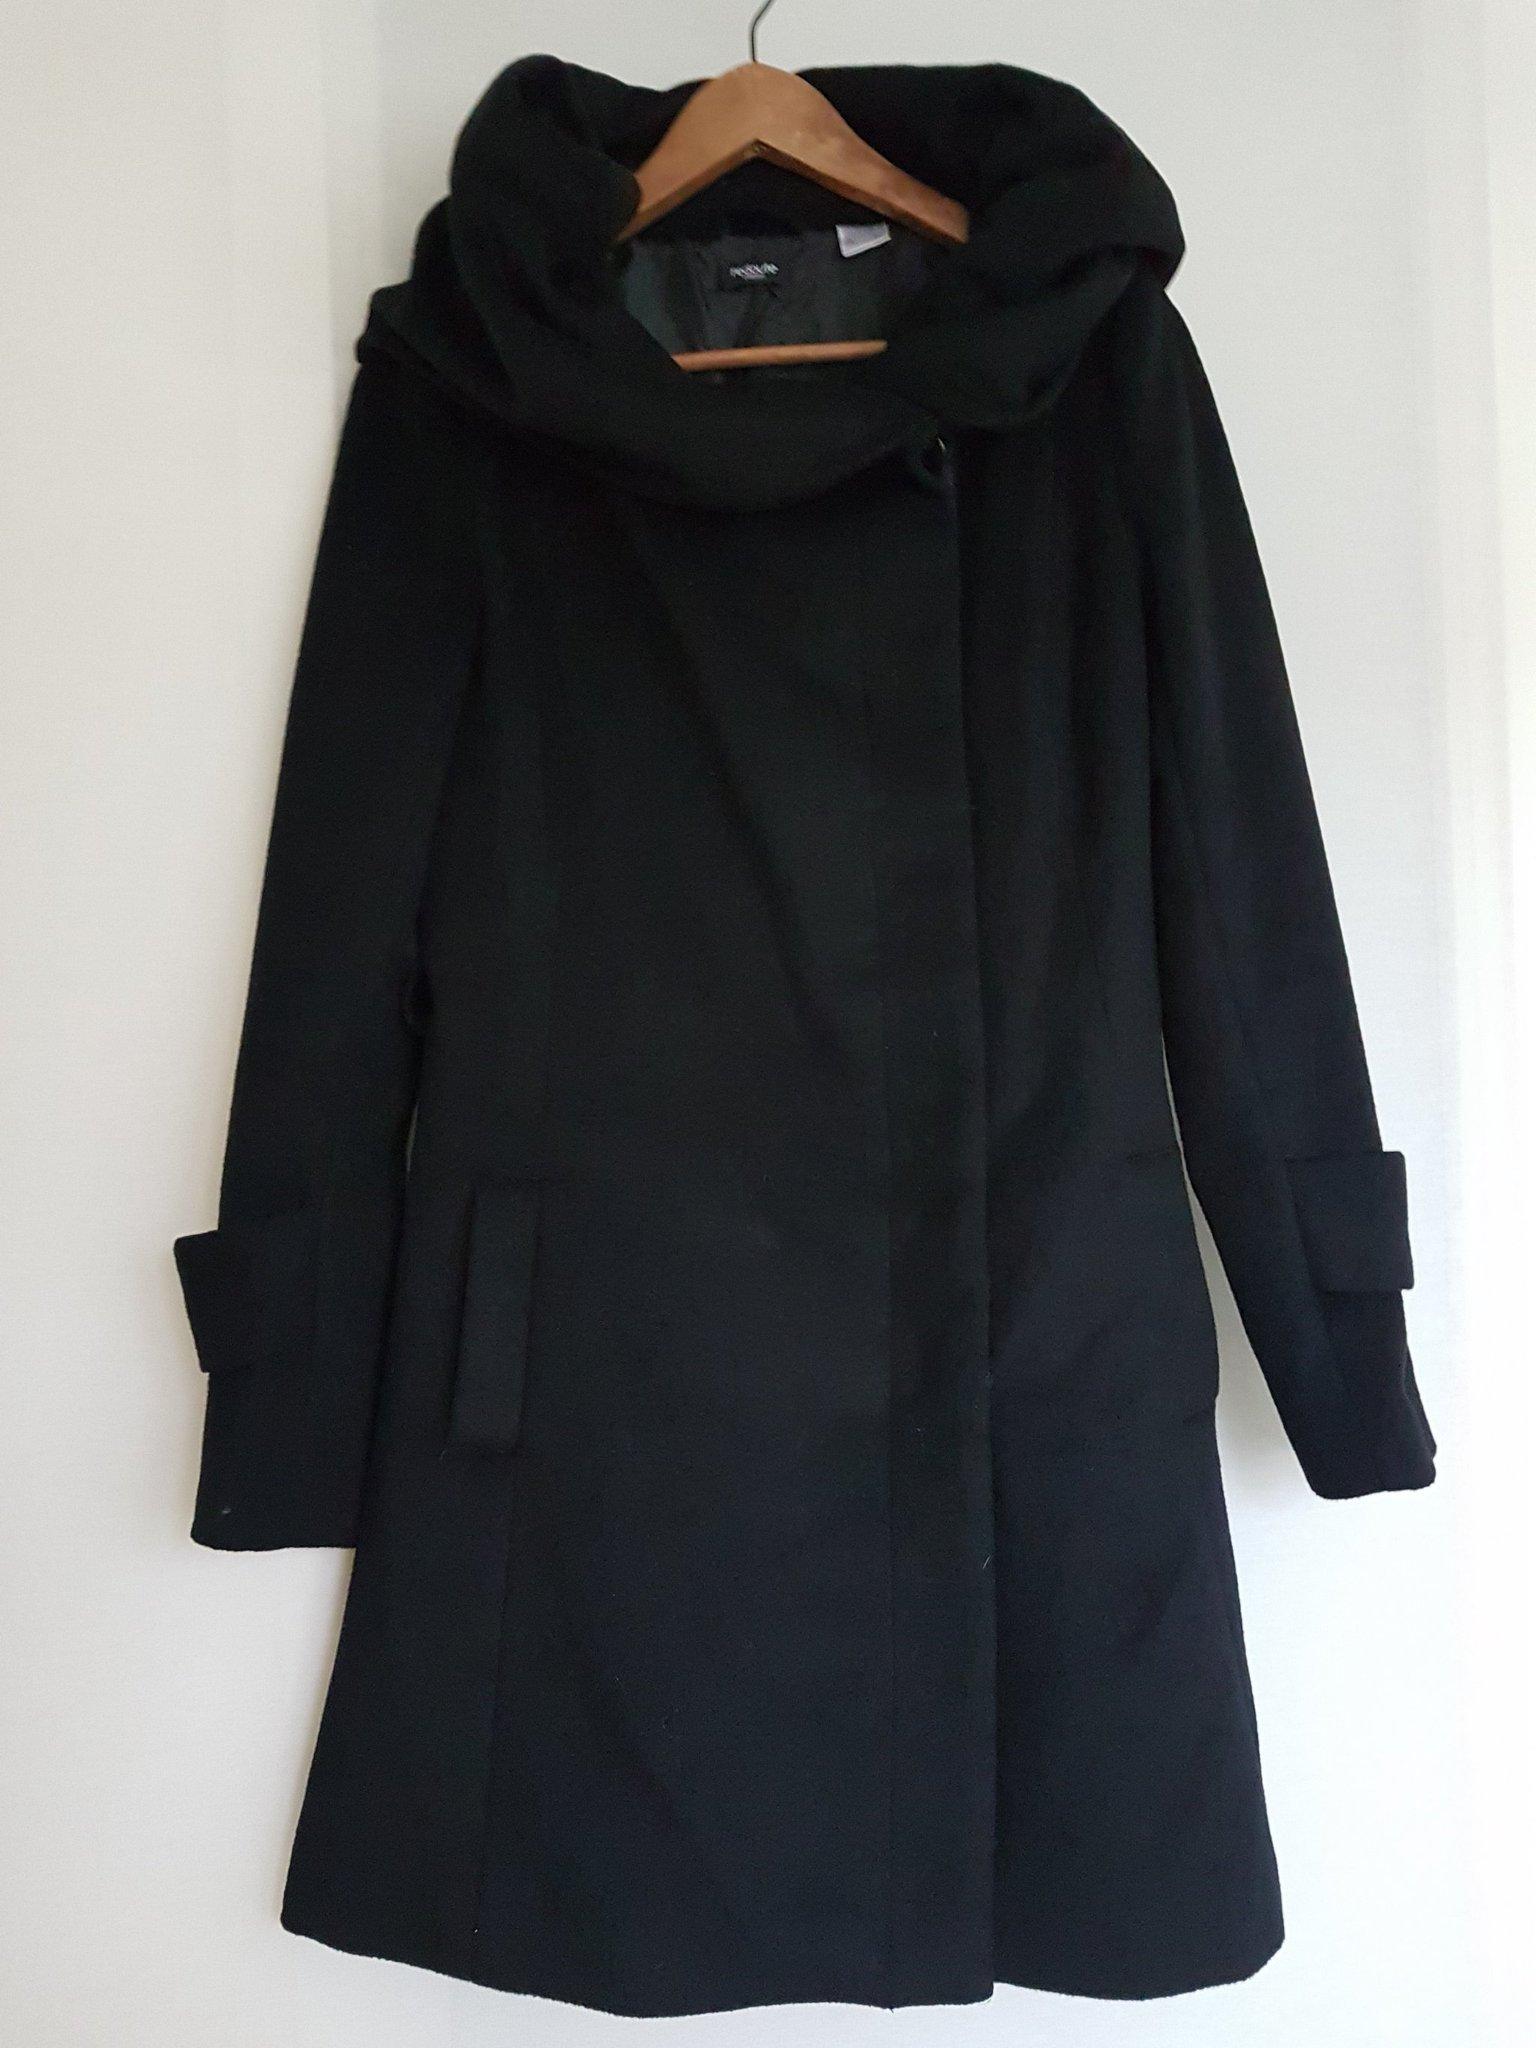 premium urval super kvalitet Bra Snygg svart kappa från La Redoute Storlek 34.St.. (375229995) ᐈ ...